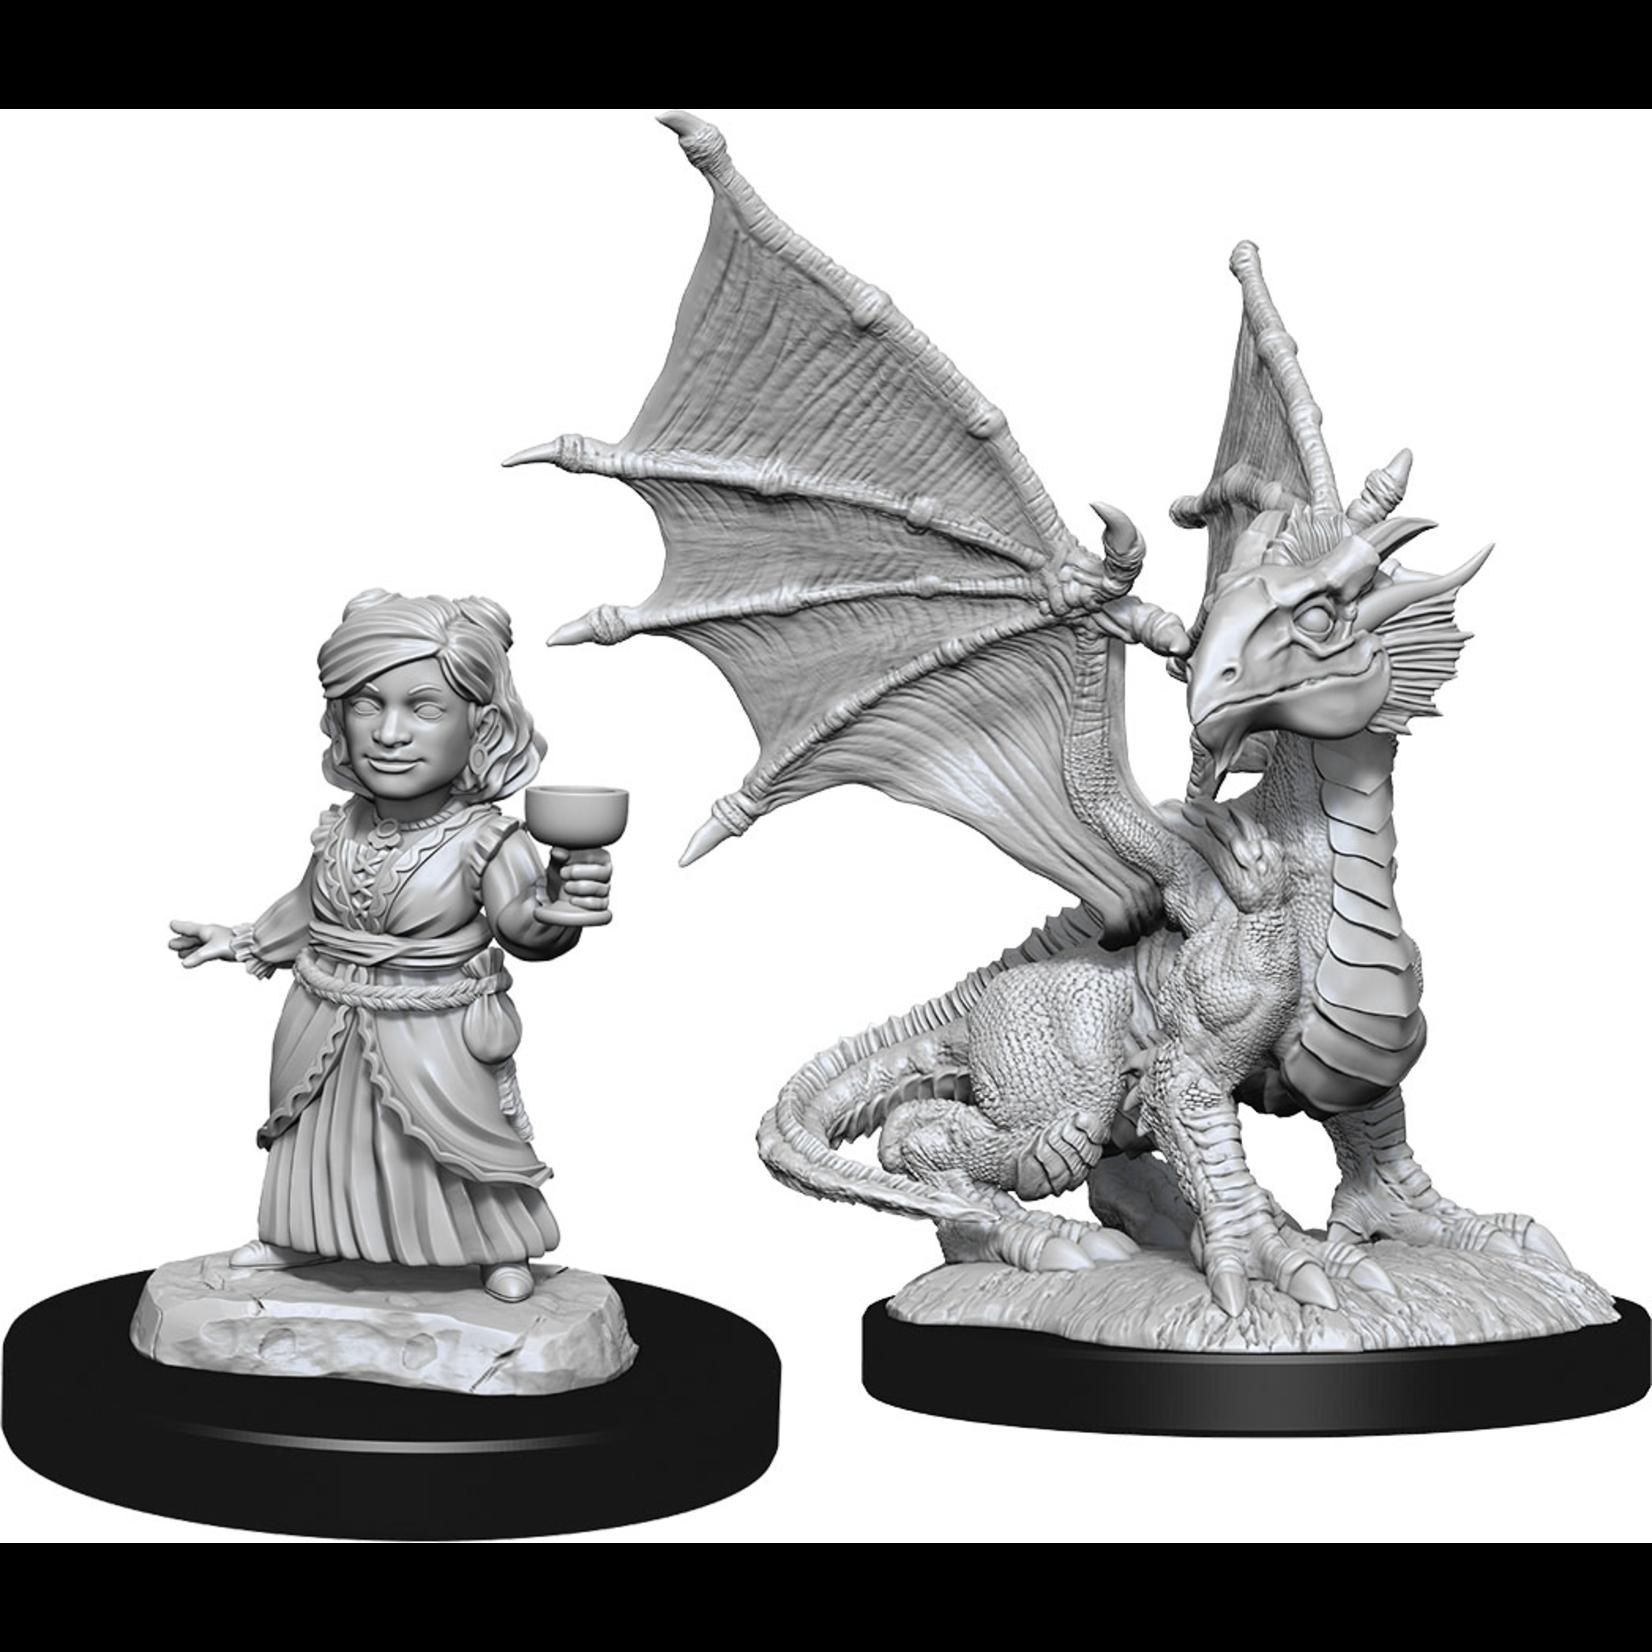 WizKids Minis Dungeons & Dragons: Silver Wyrmling & Halfling Wave 13